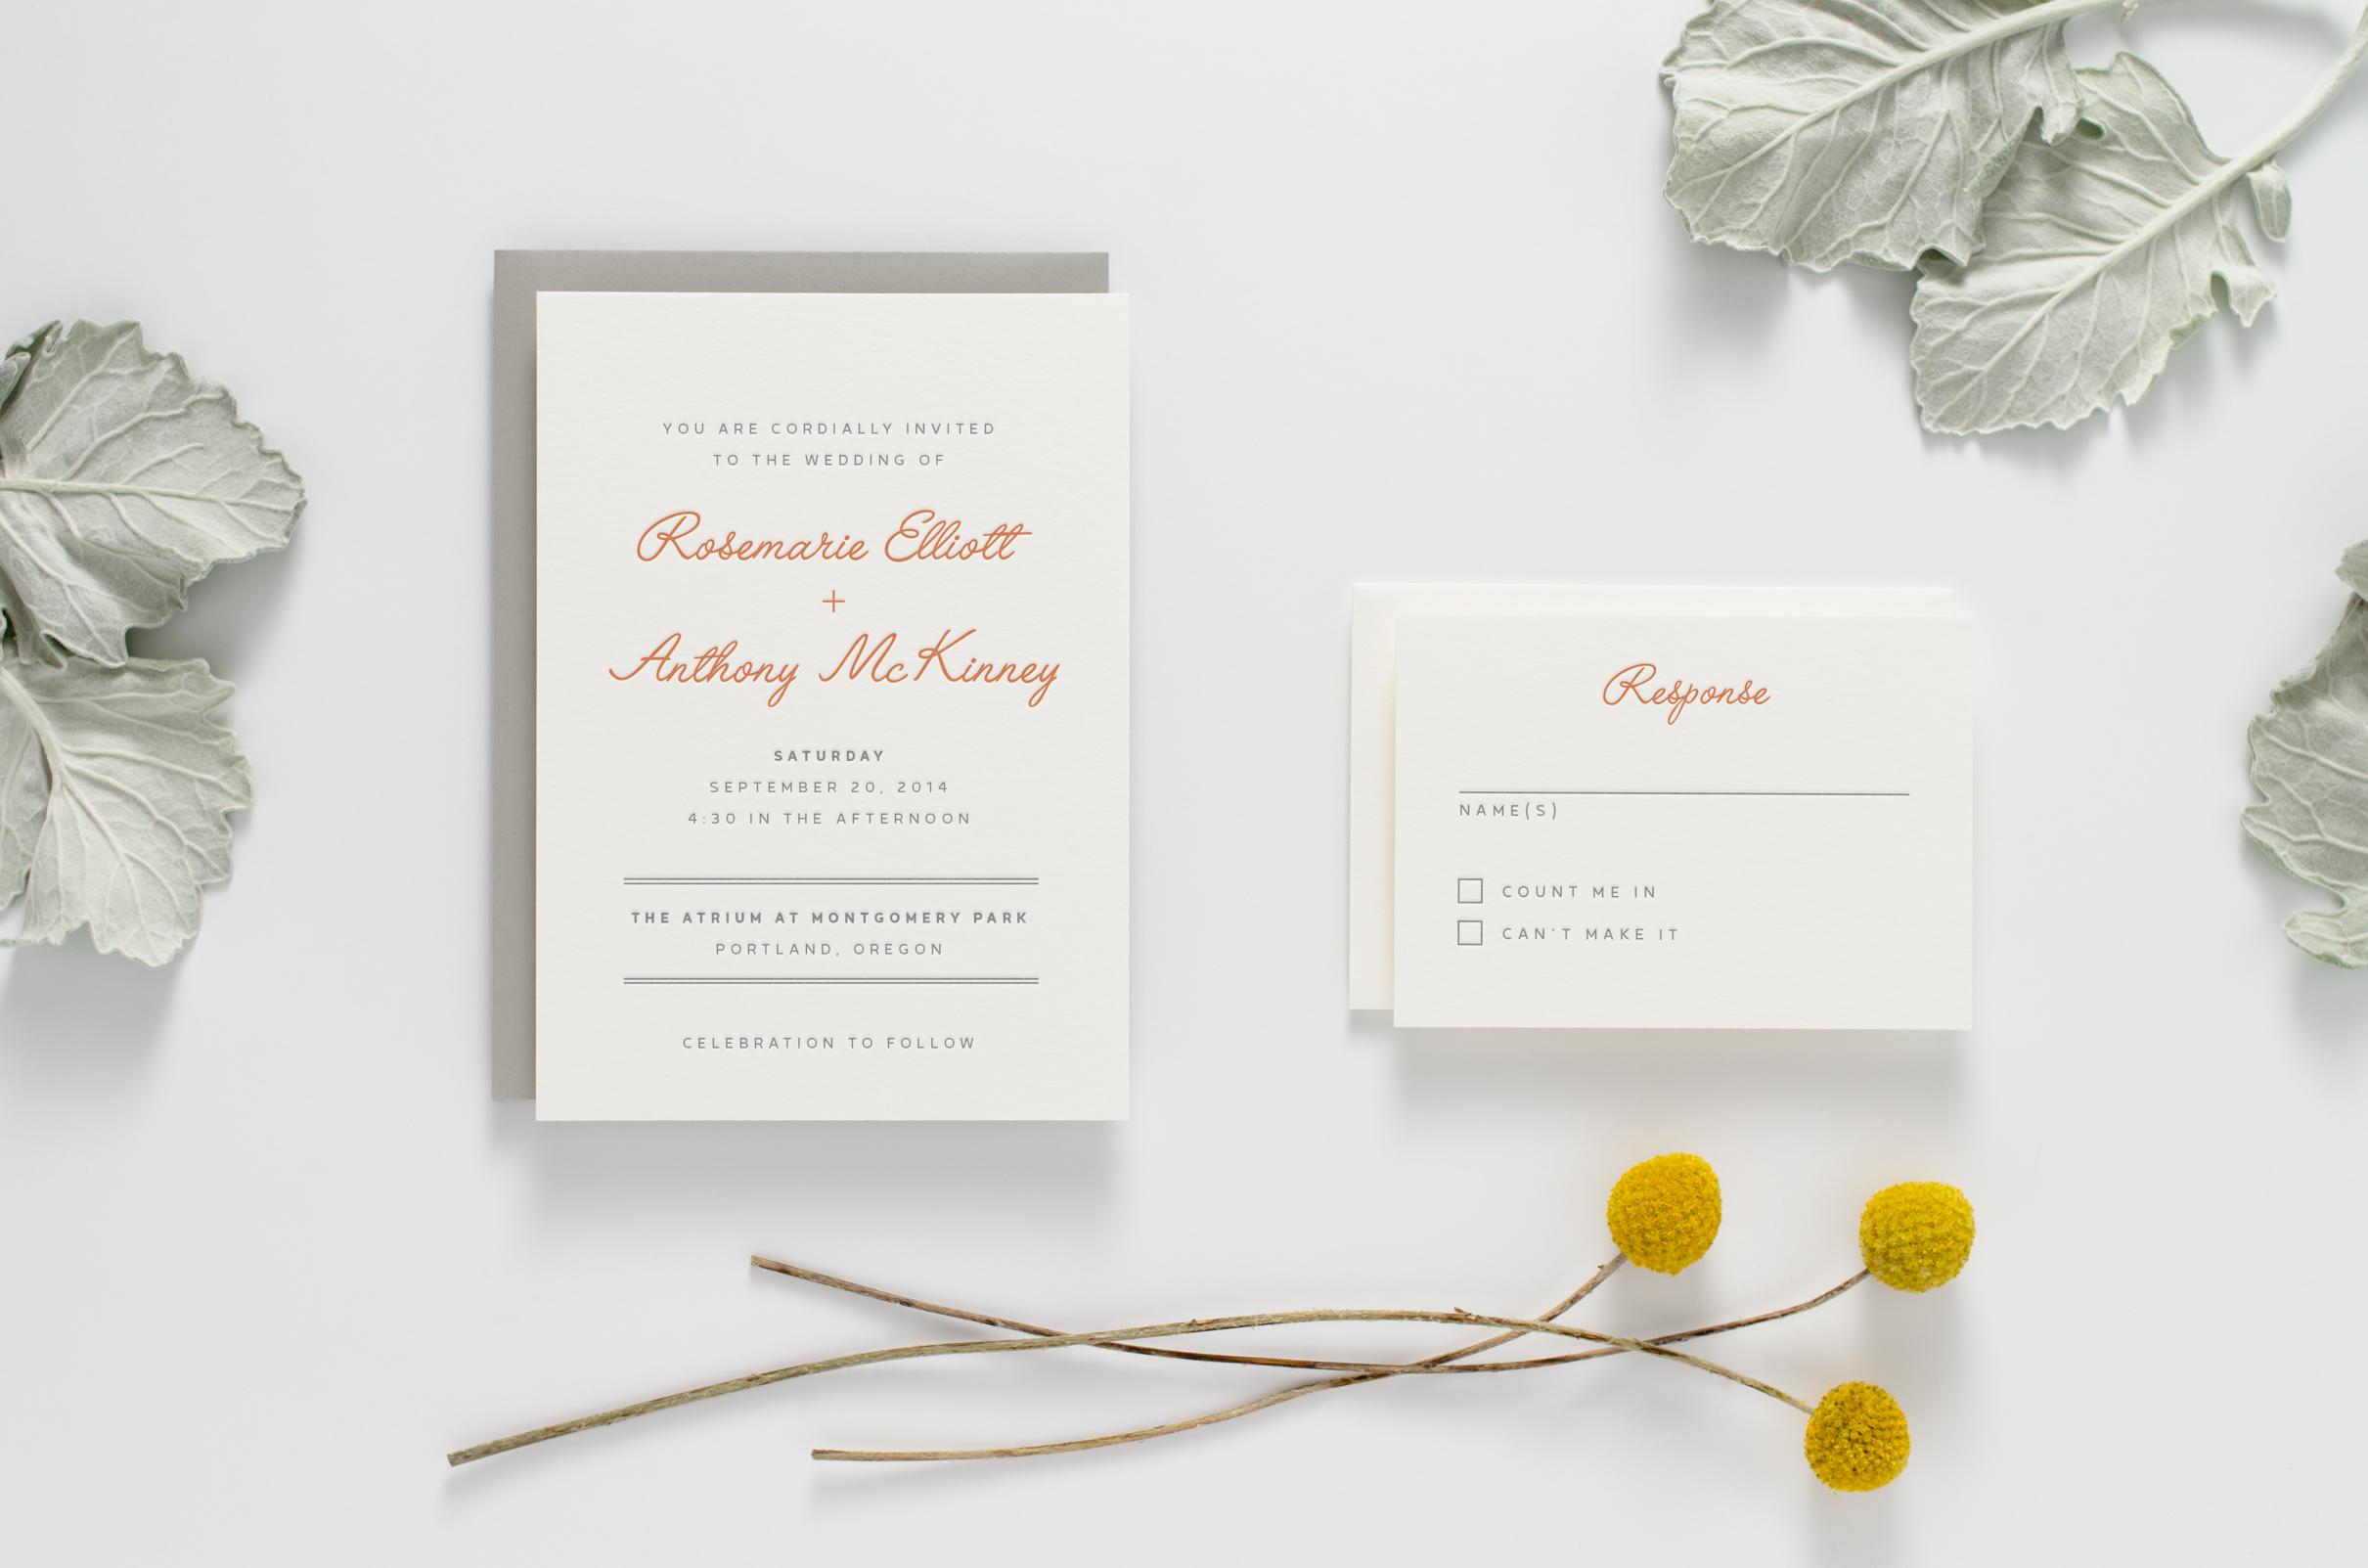 Fun, creative, modern yet retro letterpress wedding invitation suite